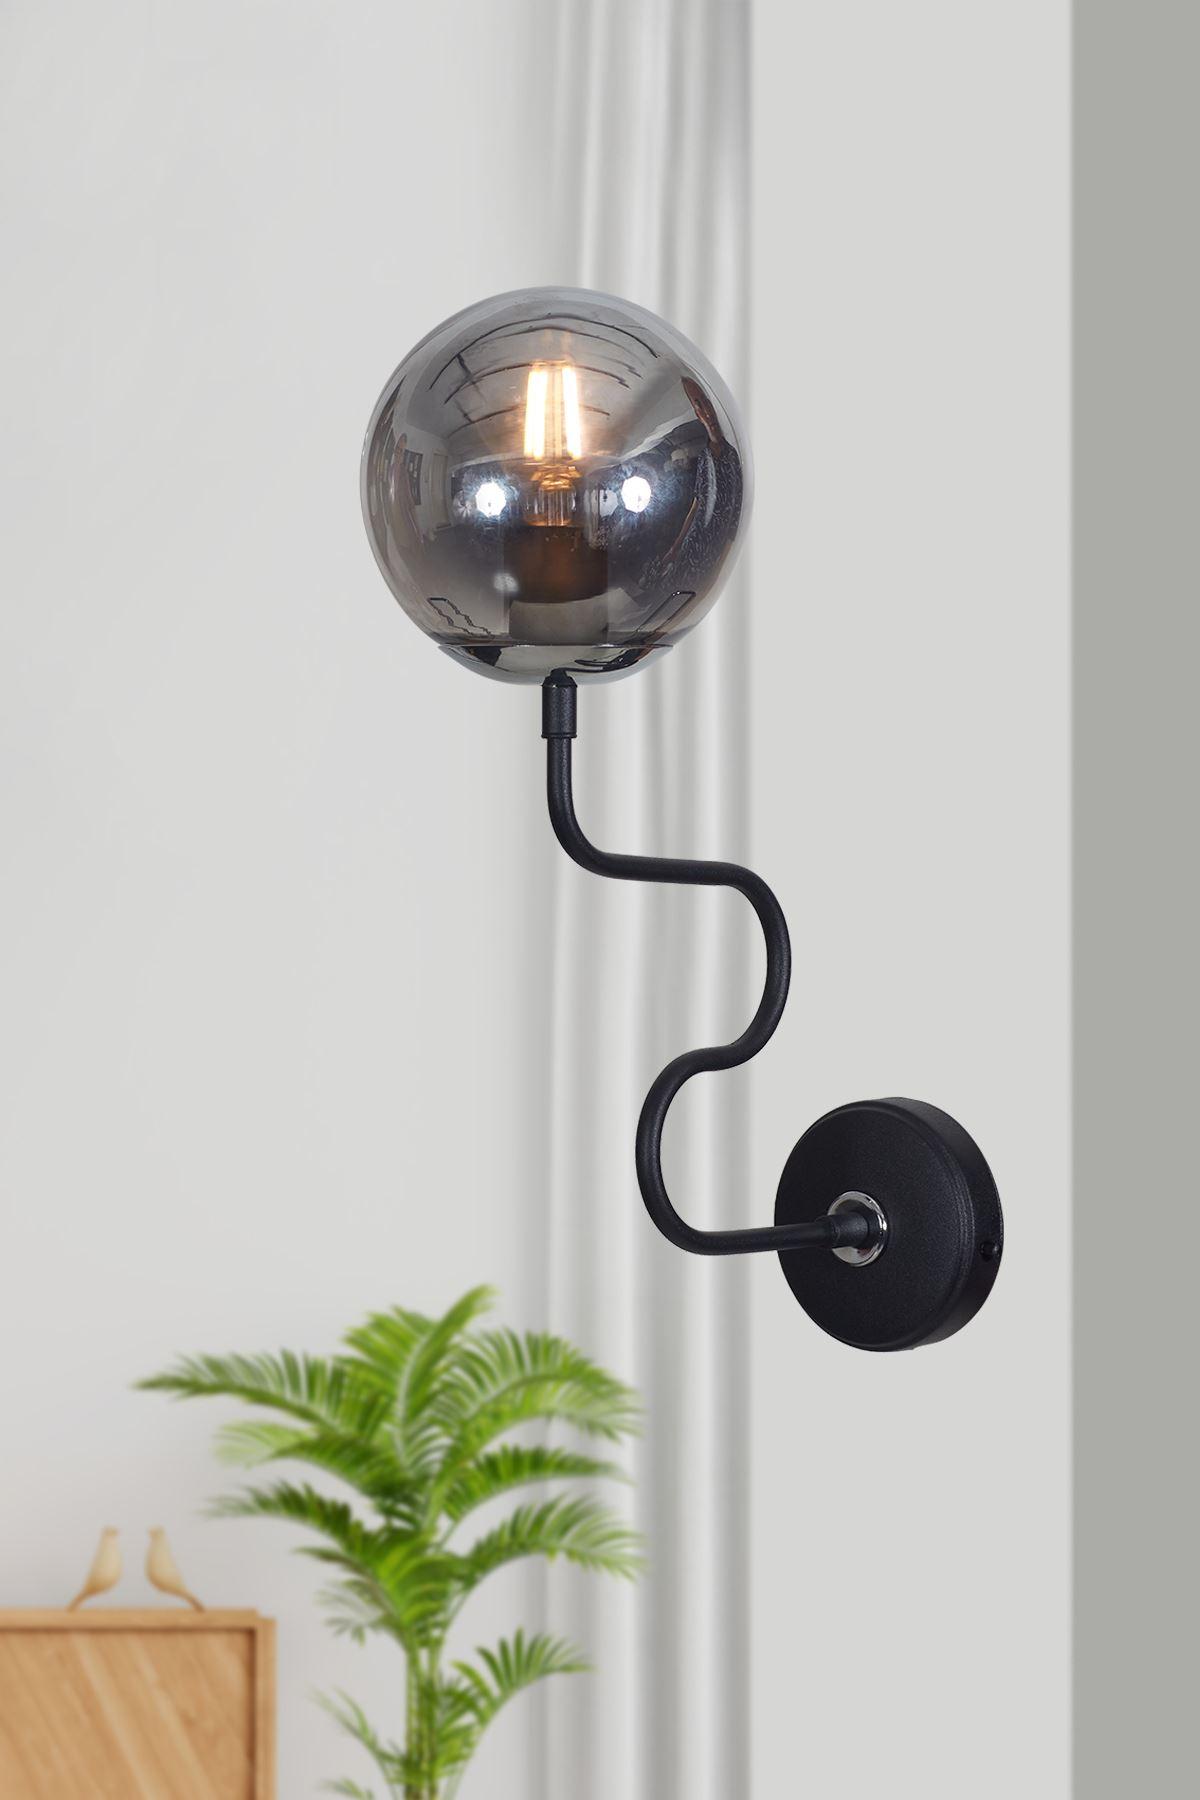 Ferro Yatay Krom-Siyah Metal Gövde Füme Camlı Tasarım Lüx Aplik